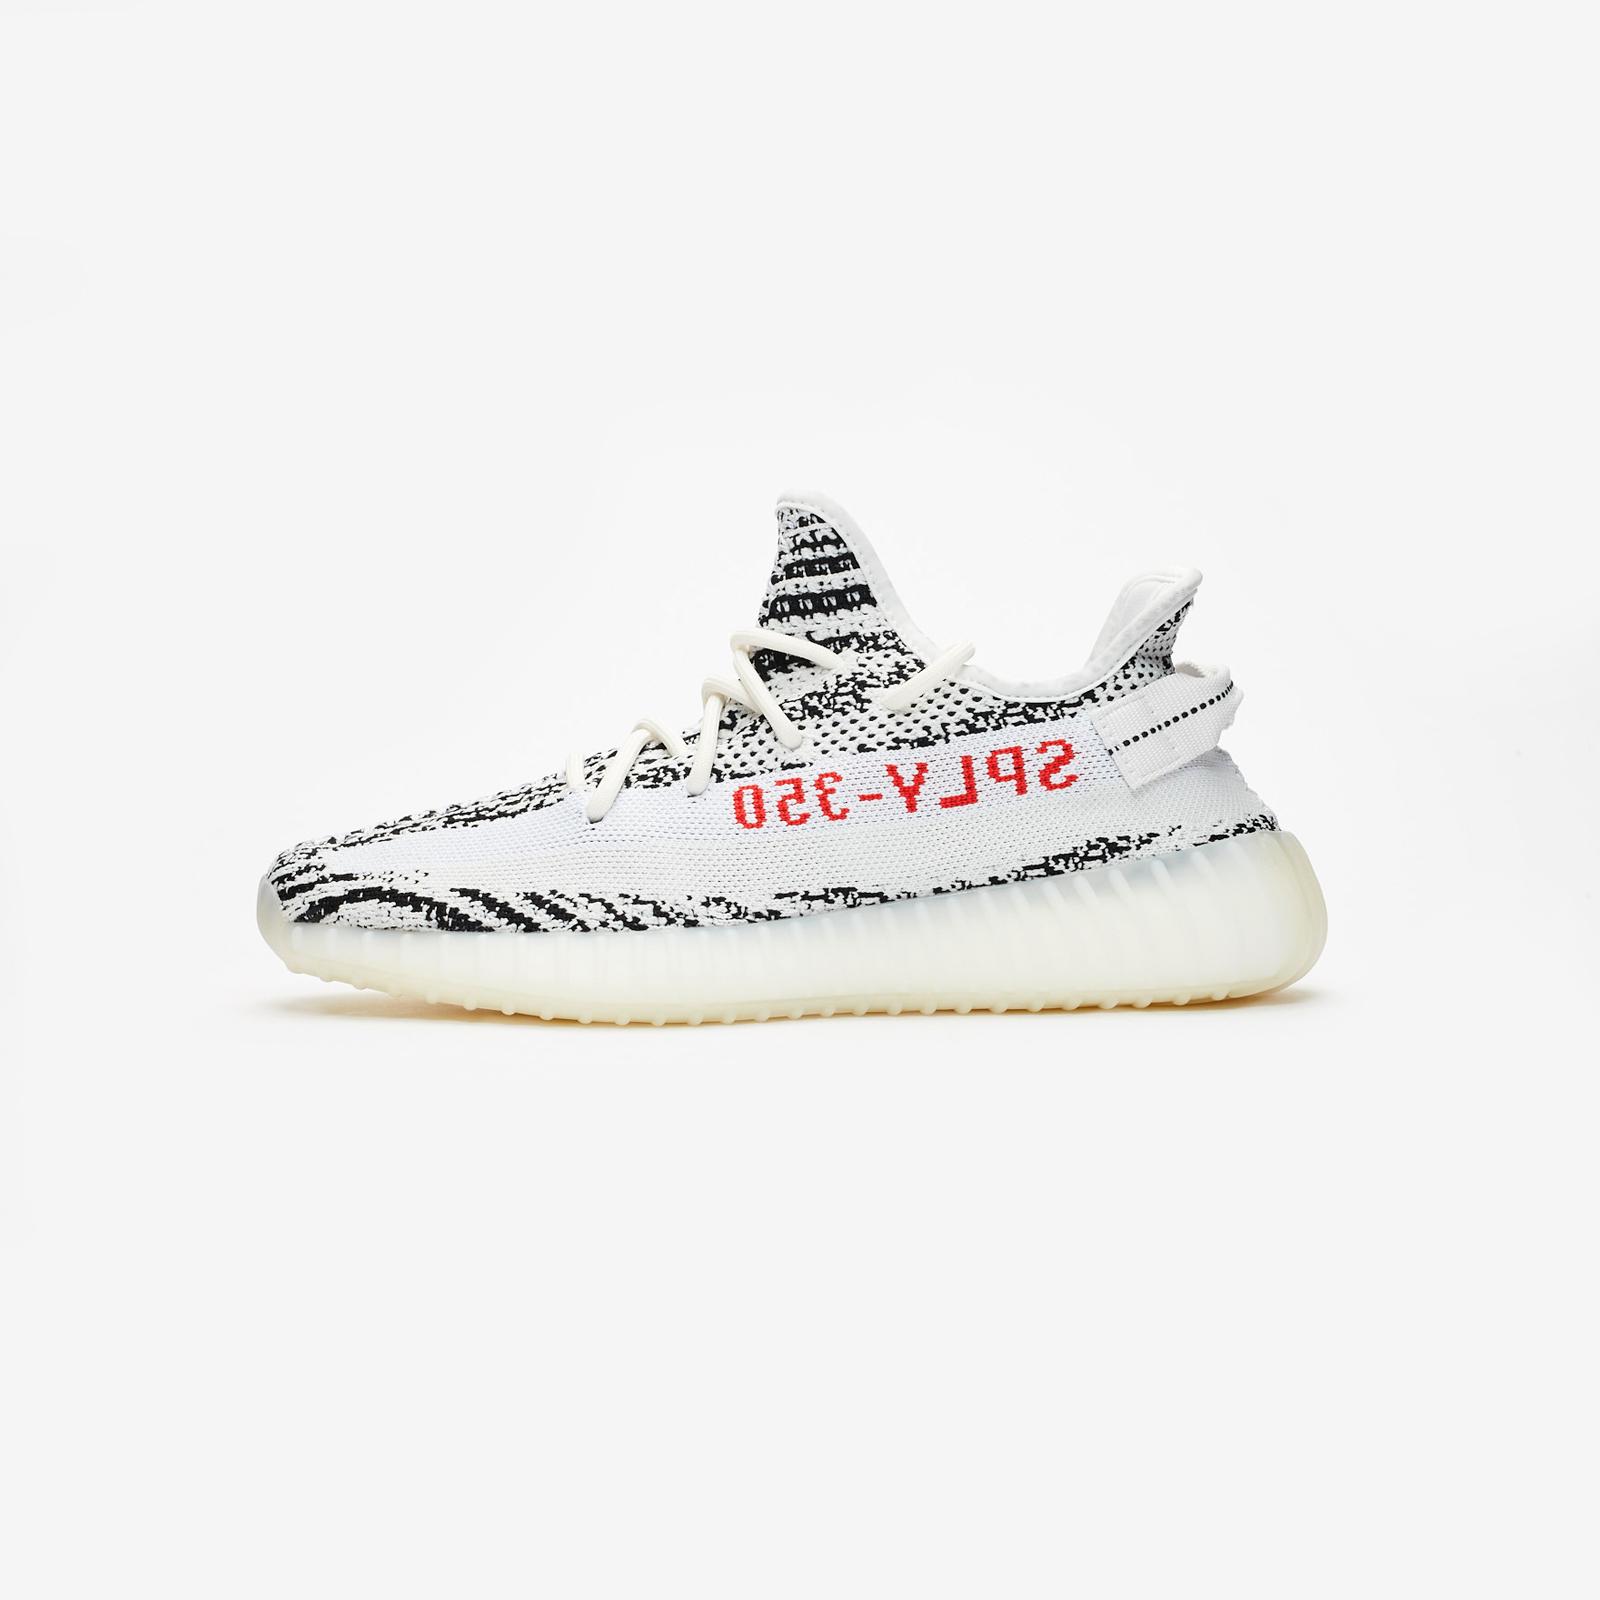 8b695215c9f adidas Yeezy Boost 350 V2 - Cp9654 - Sneakersnstuff